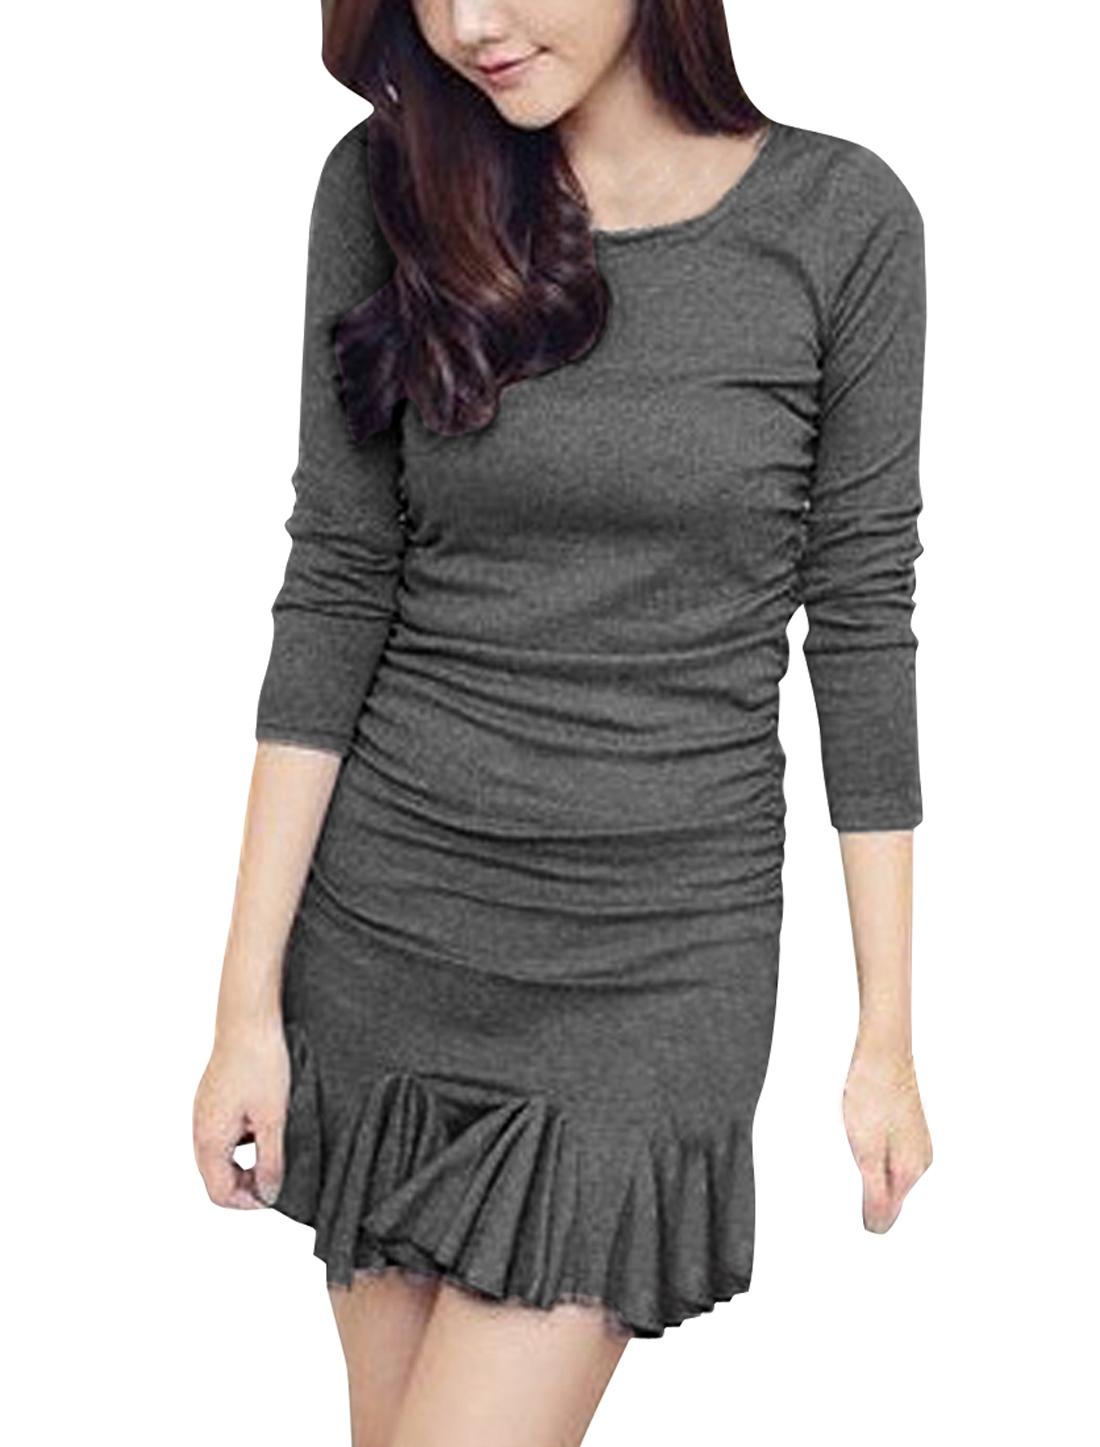 Lady Round Neck Long Sleeve Stretchy Ruffled Hem Gray Dress XS